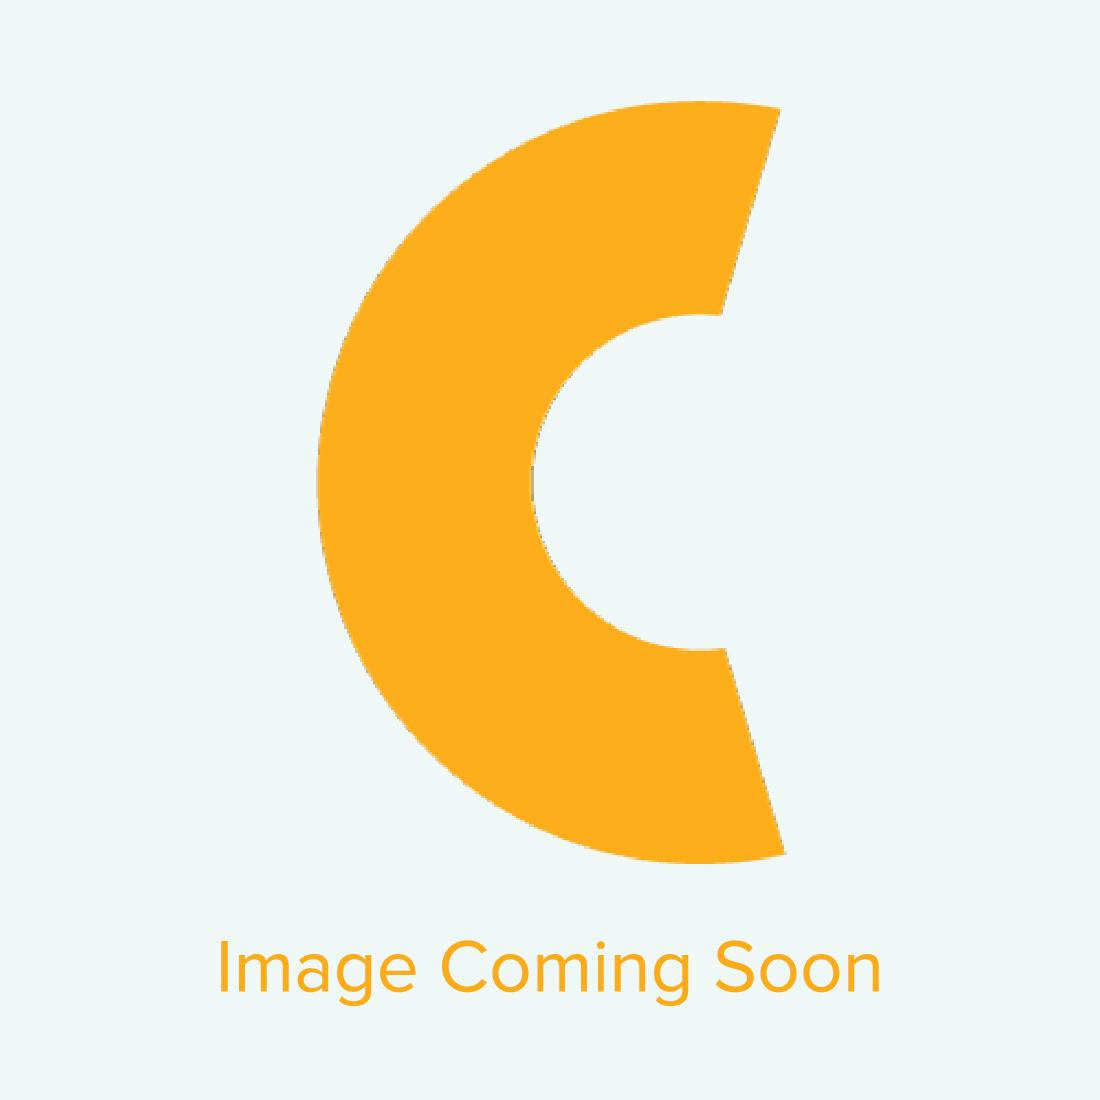 "Heat Transfer Metallic Foil - 12.5"" x 100 feet - Matte Orange - OVERSTOCK"